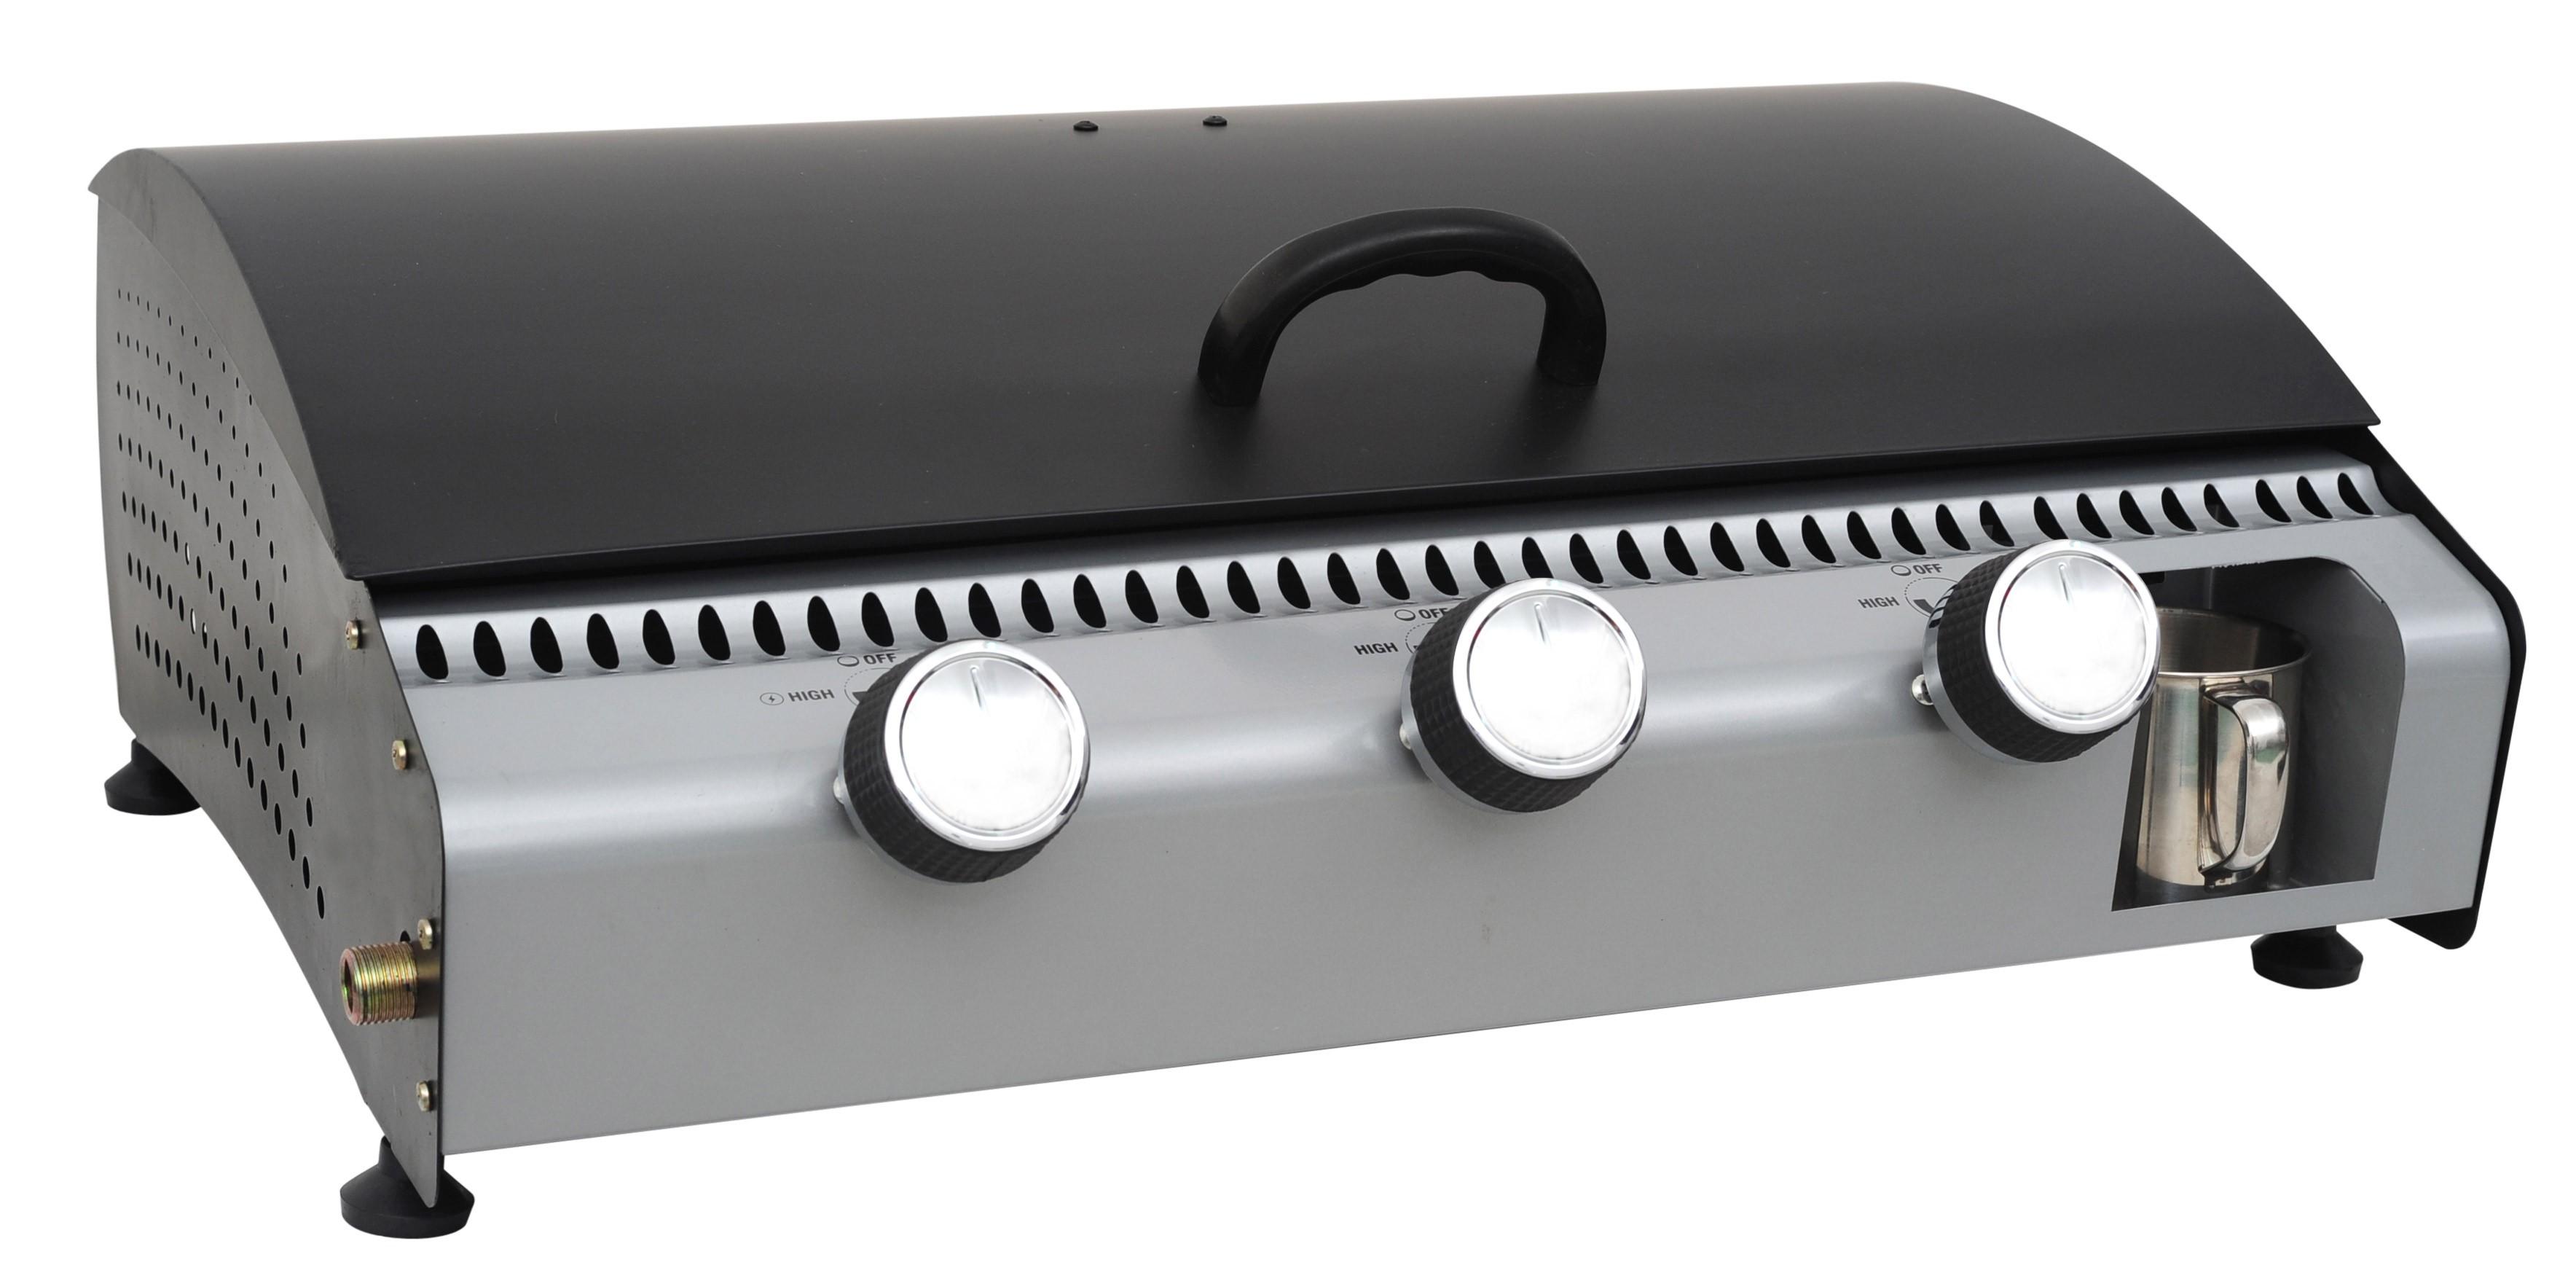 tepro gasgrill wurstbr ter plancha rockville grillfl che. Black Bedroom Furniture Sets. Home Design Ideas